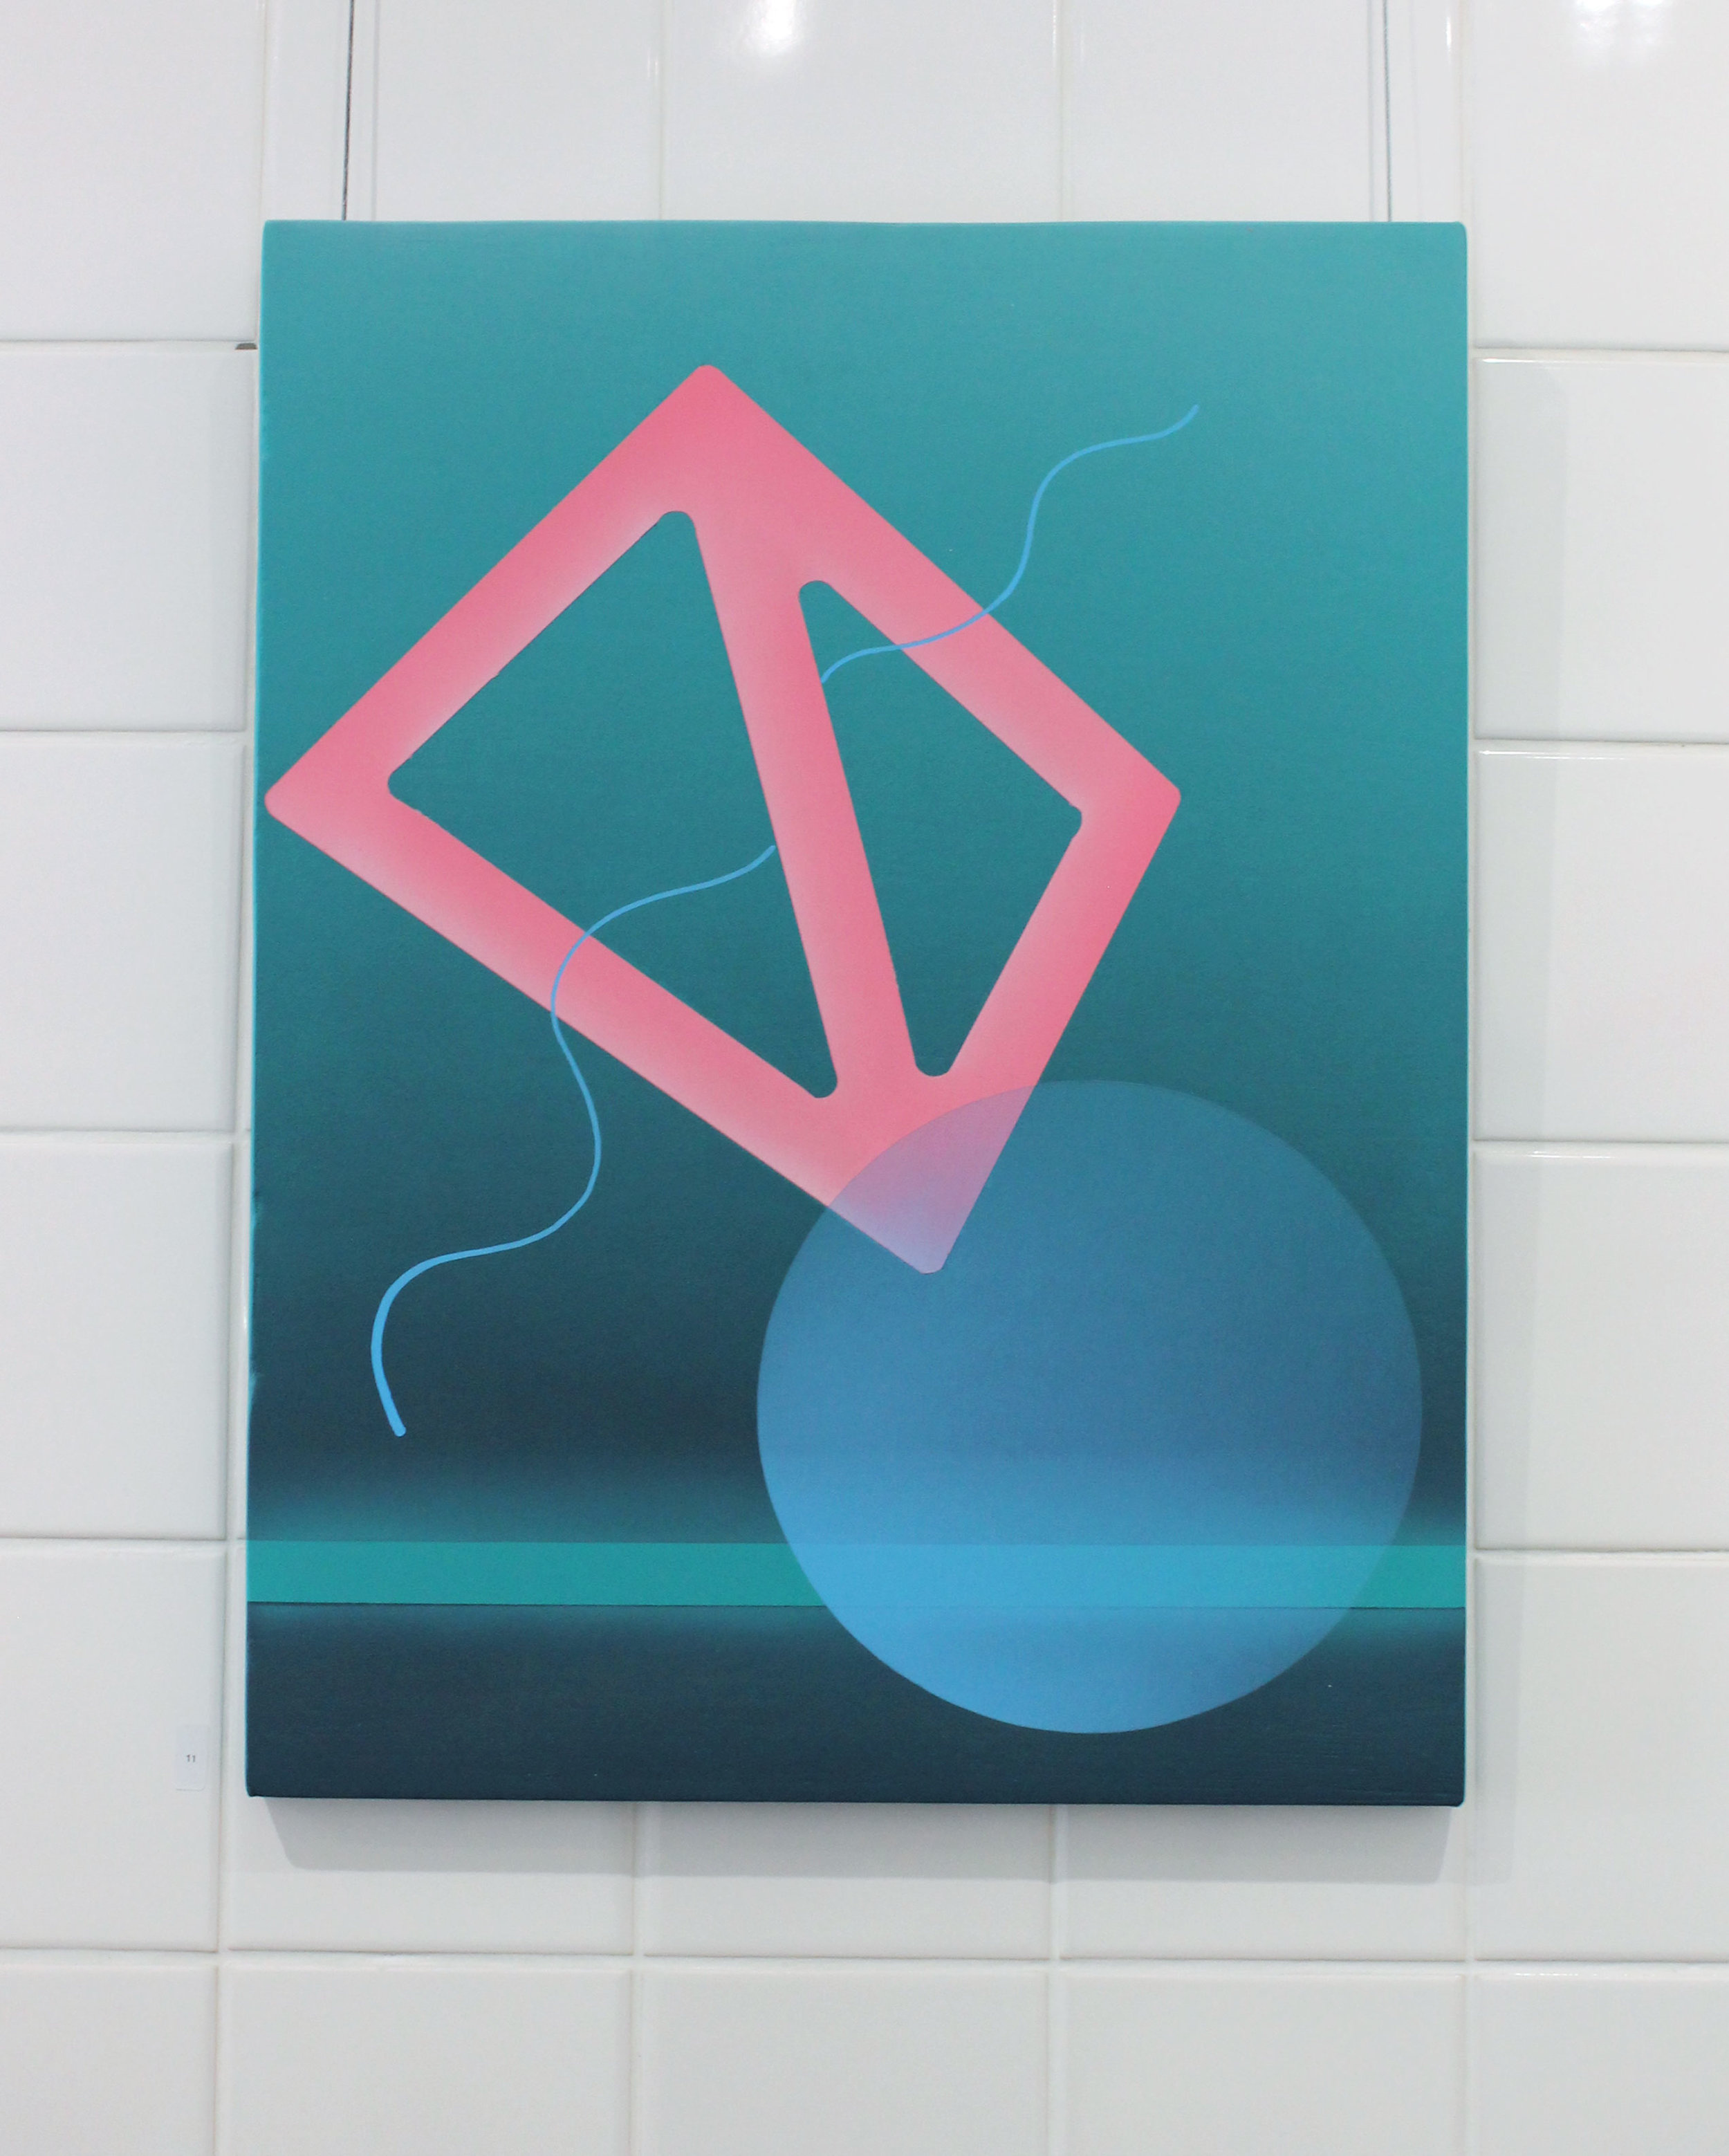 art, graphic art, Australian artist, contemporary art, Australian artist, Perth artist, painting, futuristic, gradient, exhibition, disabled artist, bruno booth